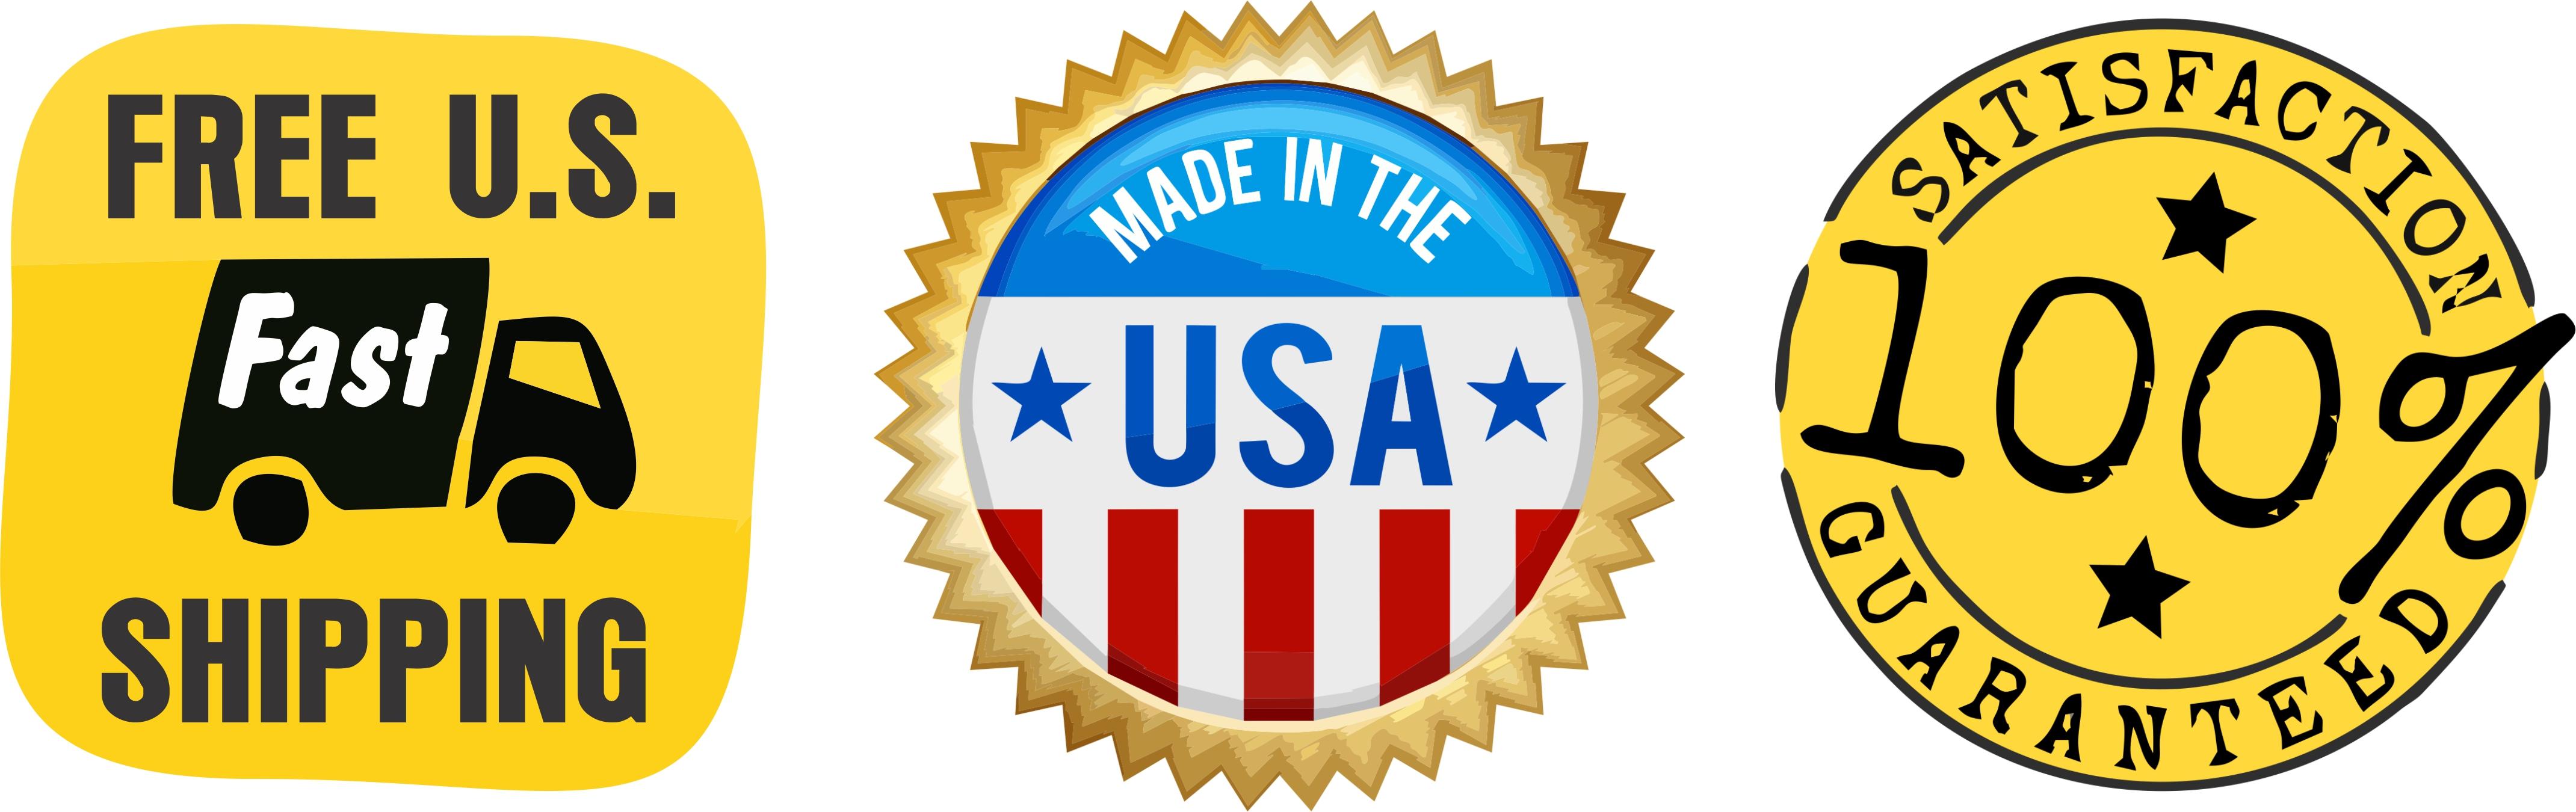 Free US Shipping! Made in USA! 100% Guarantee!